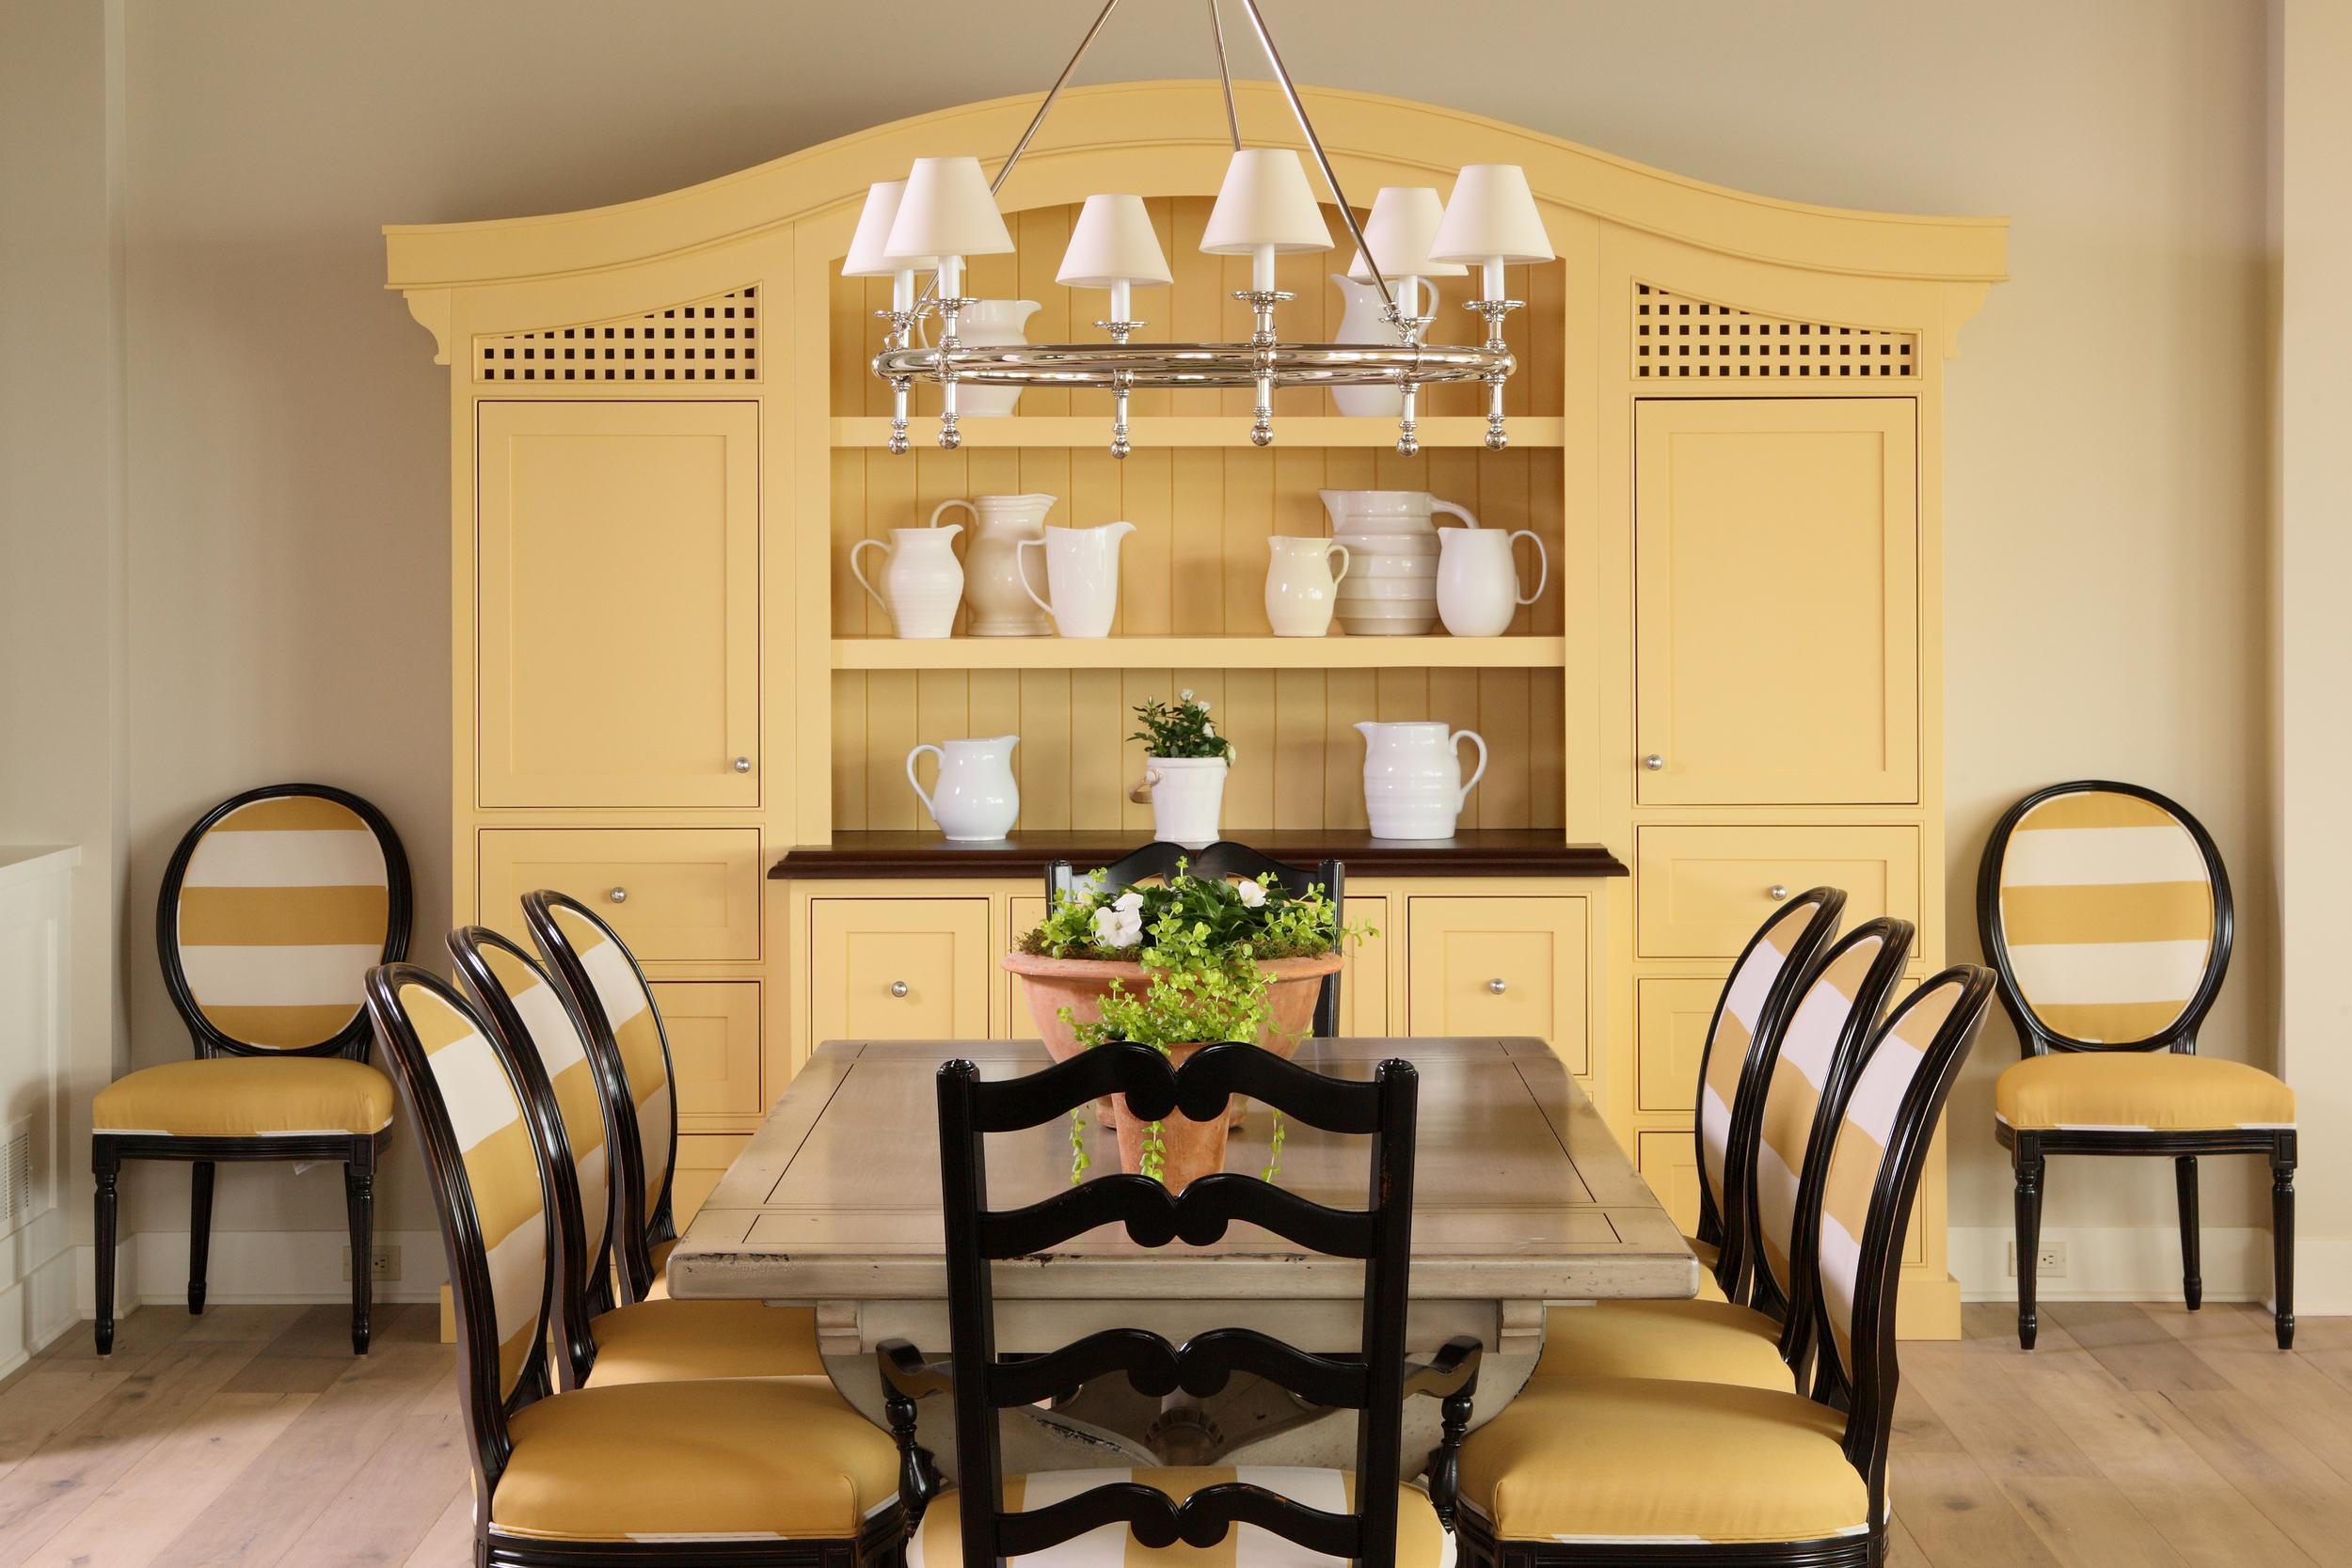 Dining Room_Design Home 1023.jpg